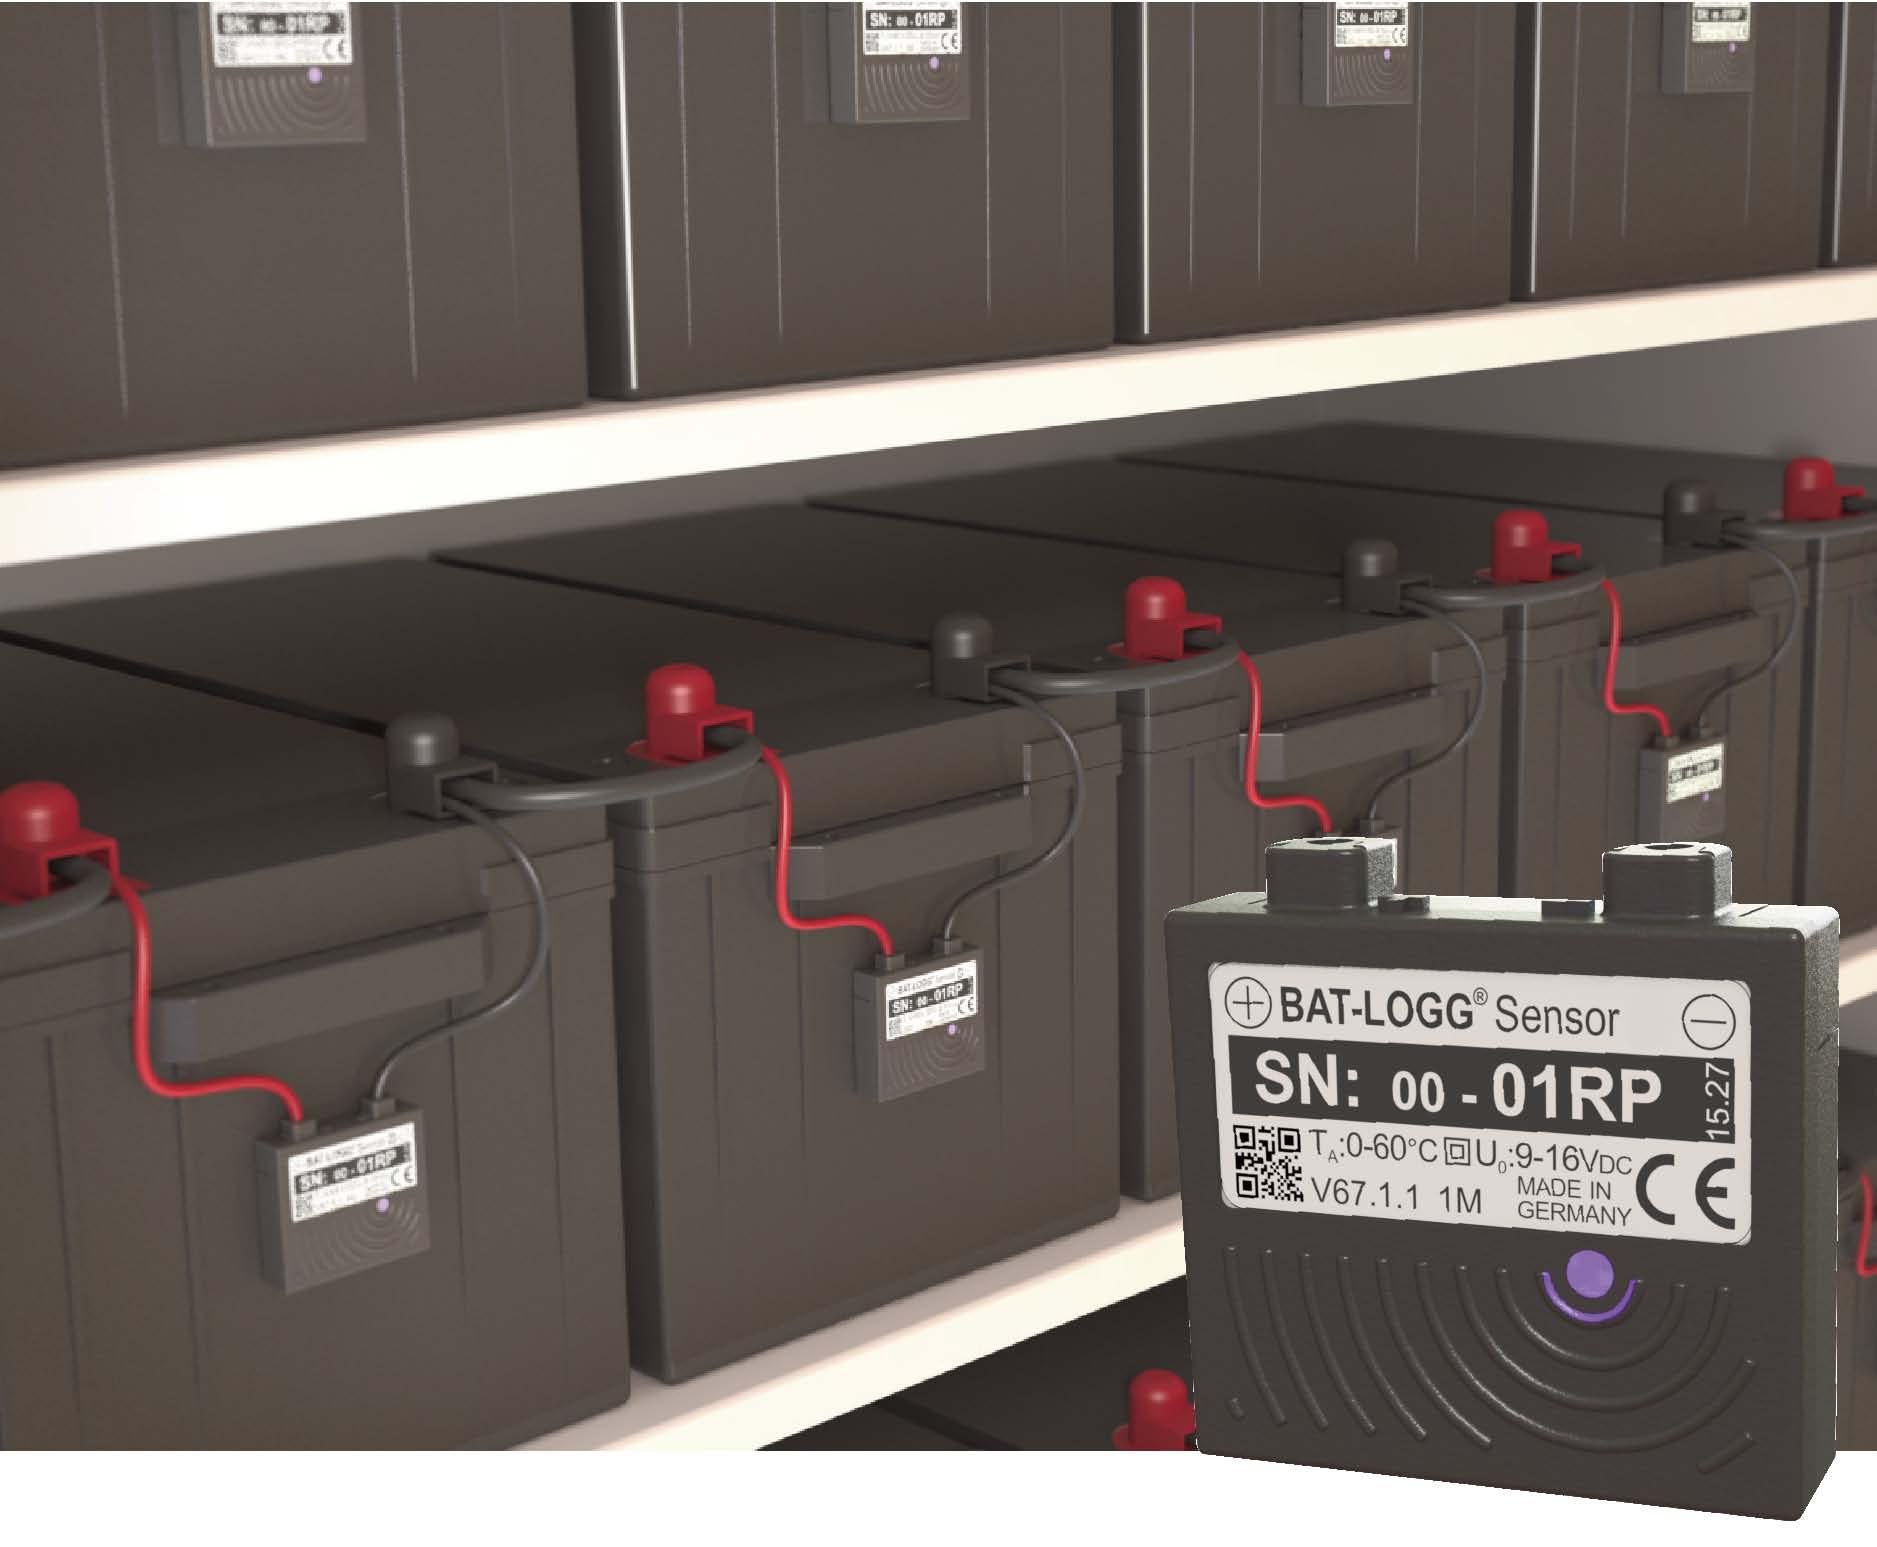 1 Stk Einzelblockbatt.überwachung Batlogg® f.18 Batterien 65-260Ah NLBTSMC181